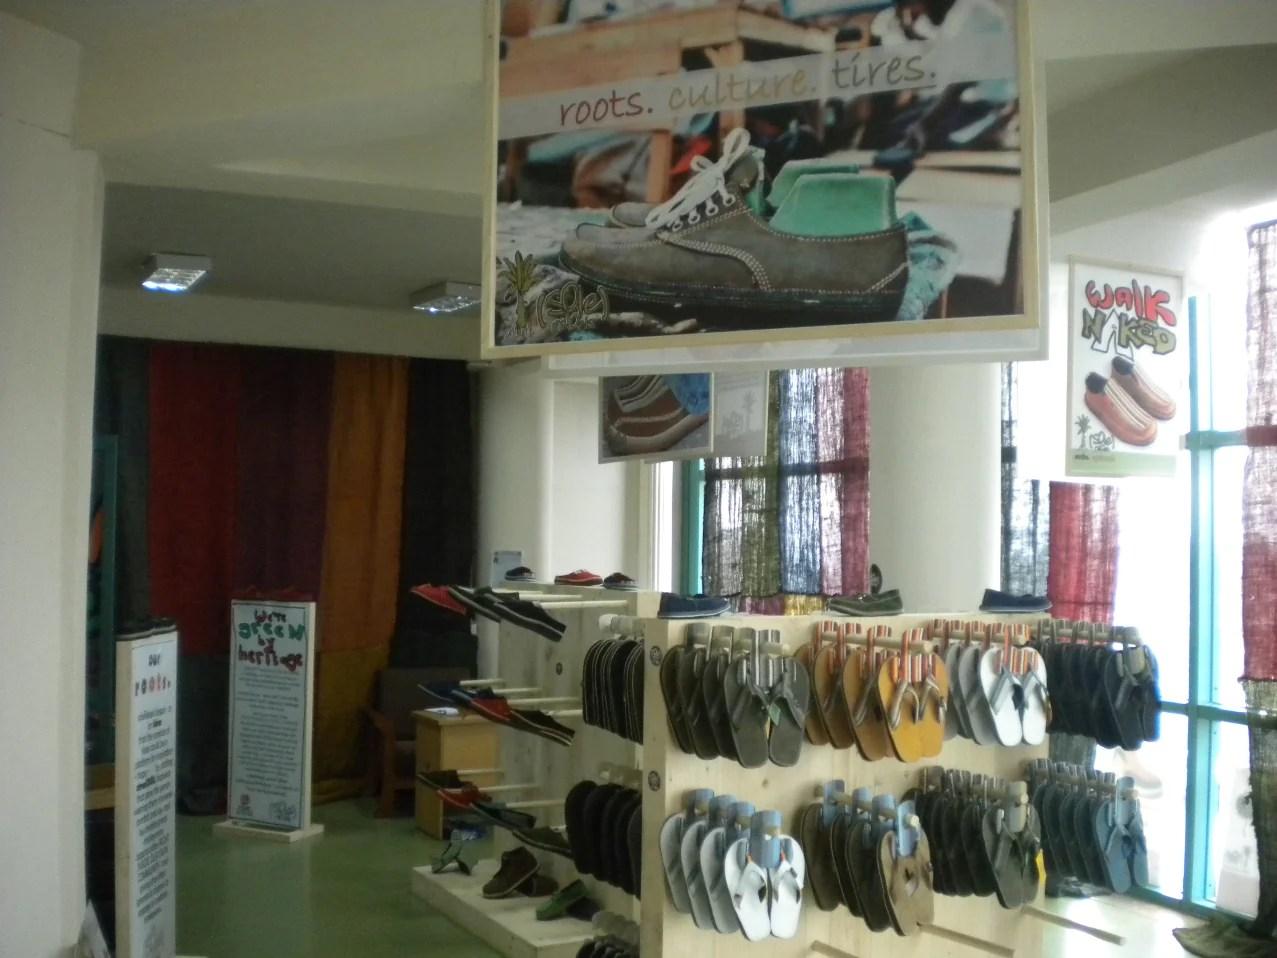 soleRebels retail store in Ethiopia